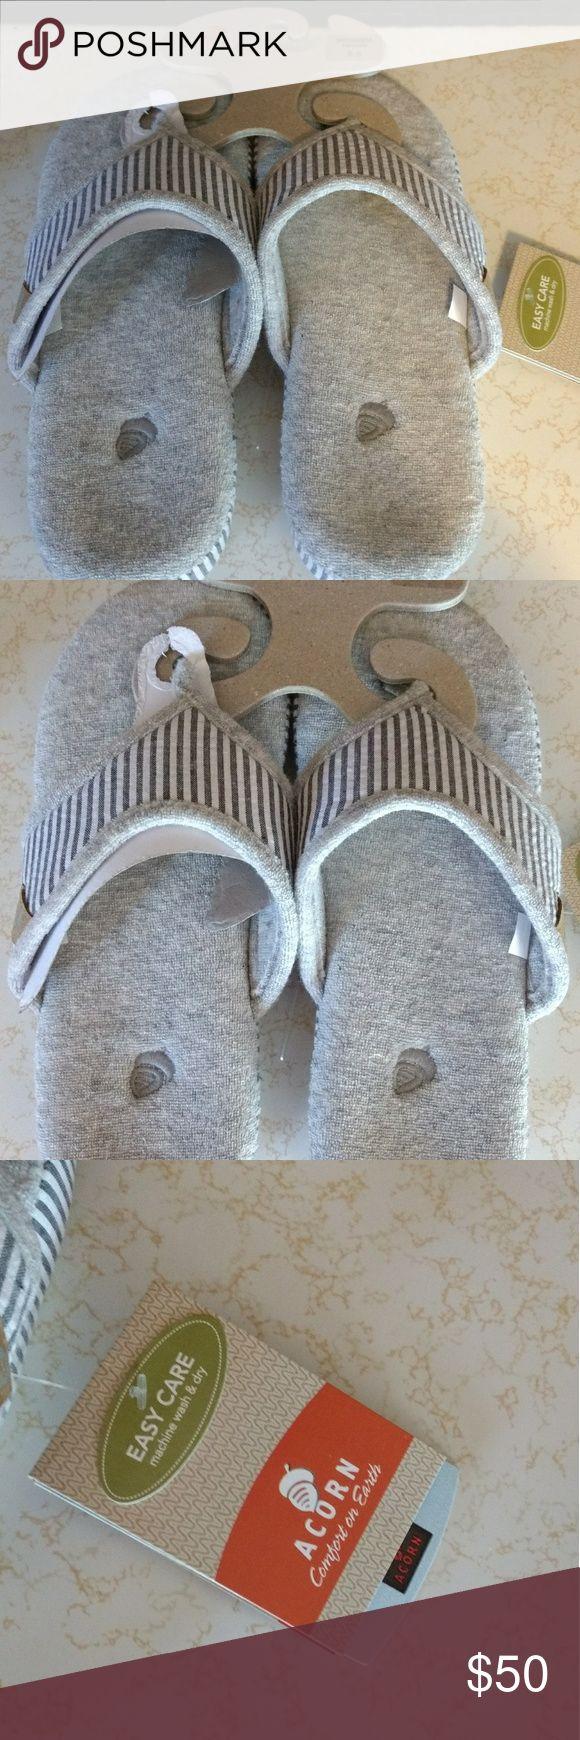 Acorn spa thongs Brand new, very cushy and soft. Acorn Shoes